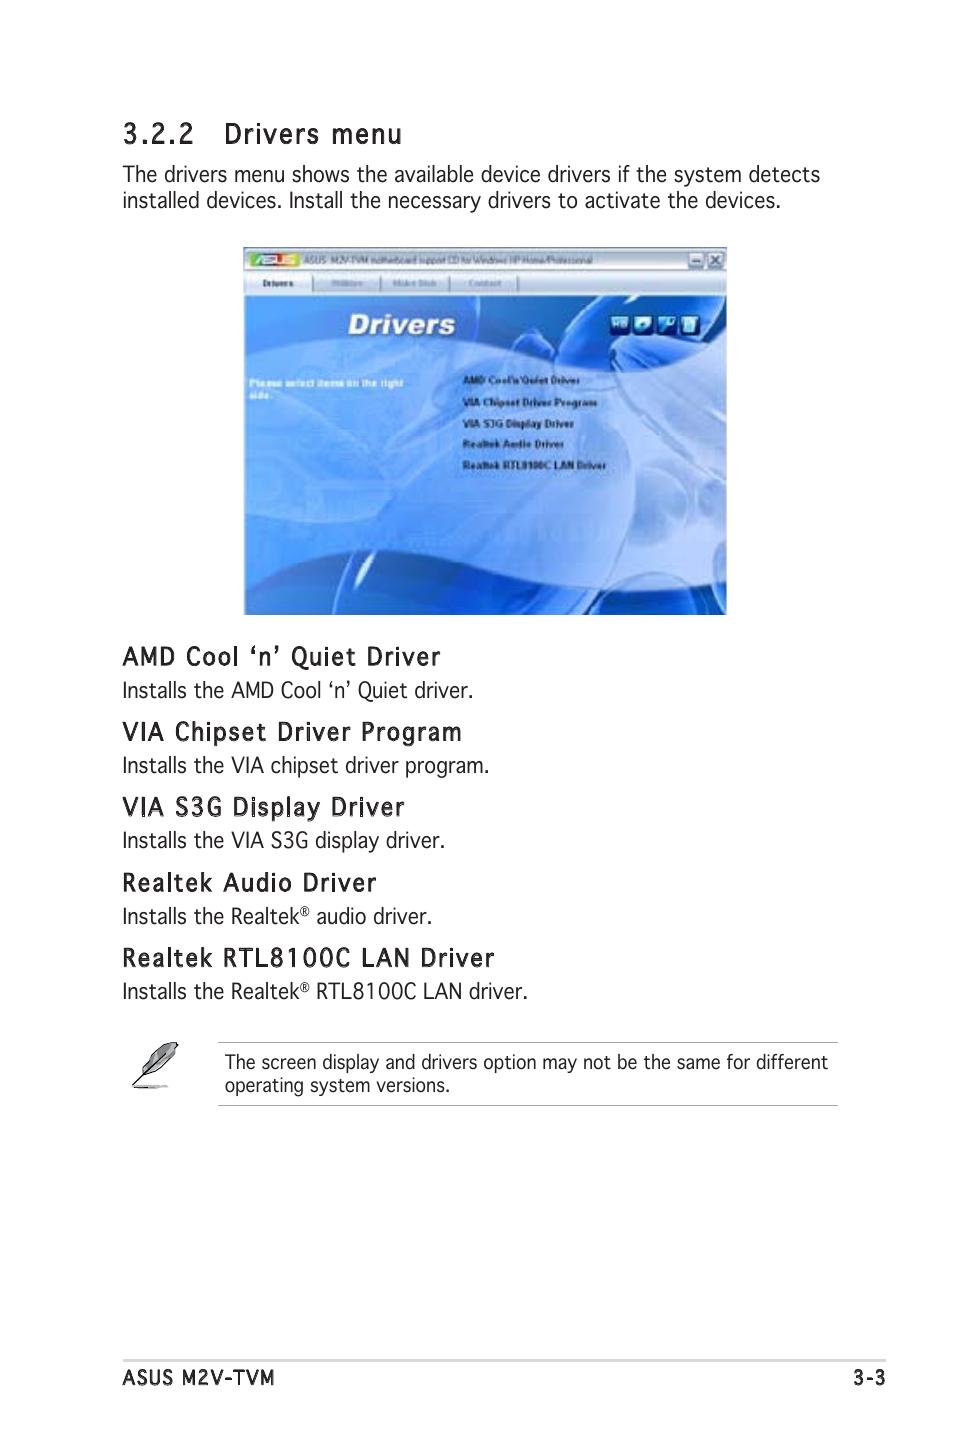 2 drivers menu asus m2v tvm user manual page 79 82 original mode rh manualsdir com Images NYS Drivers Manual Drivers Manual Book